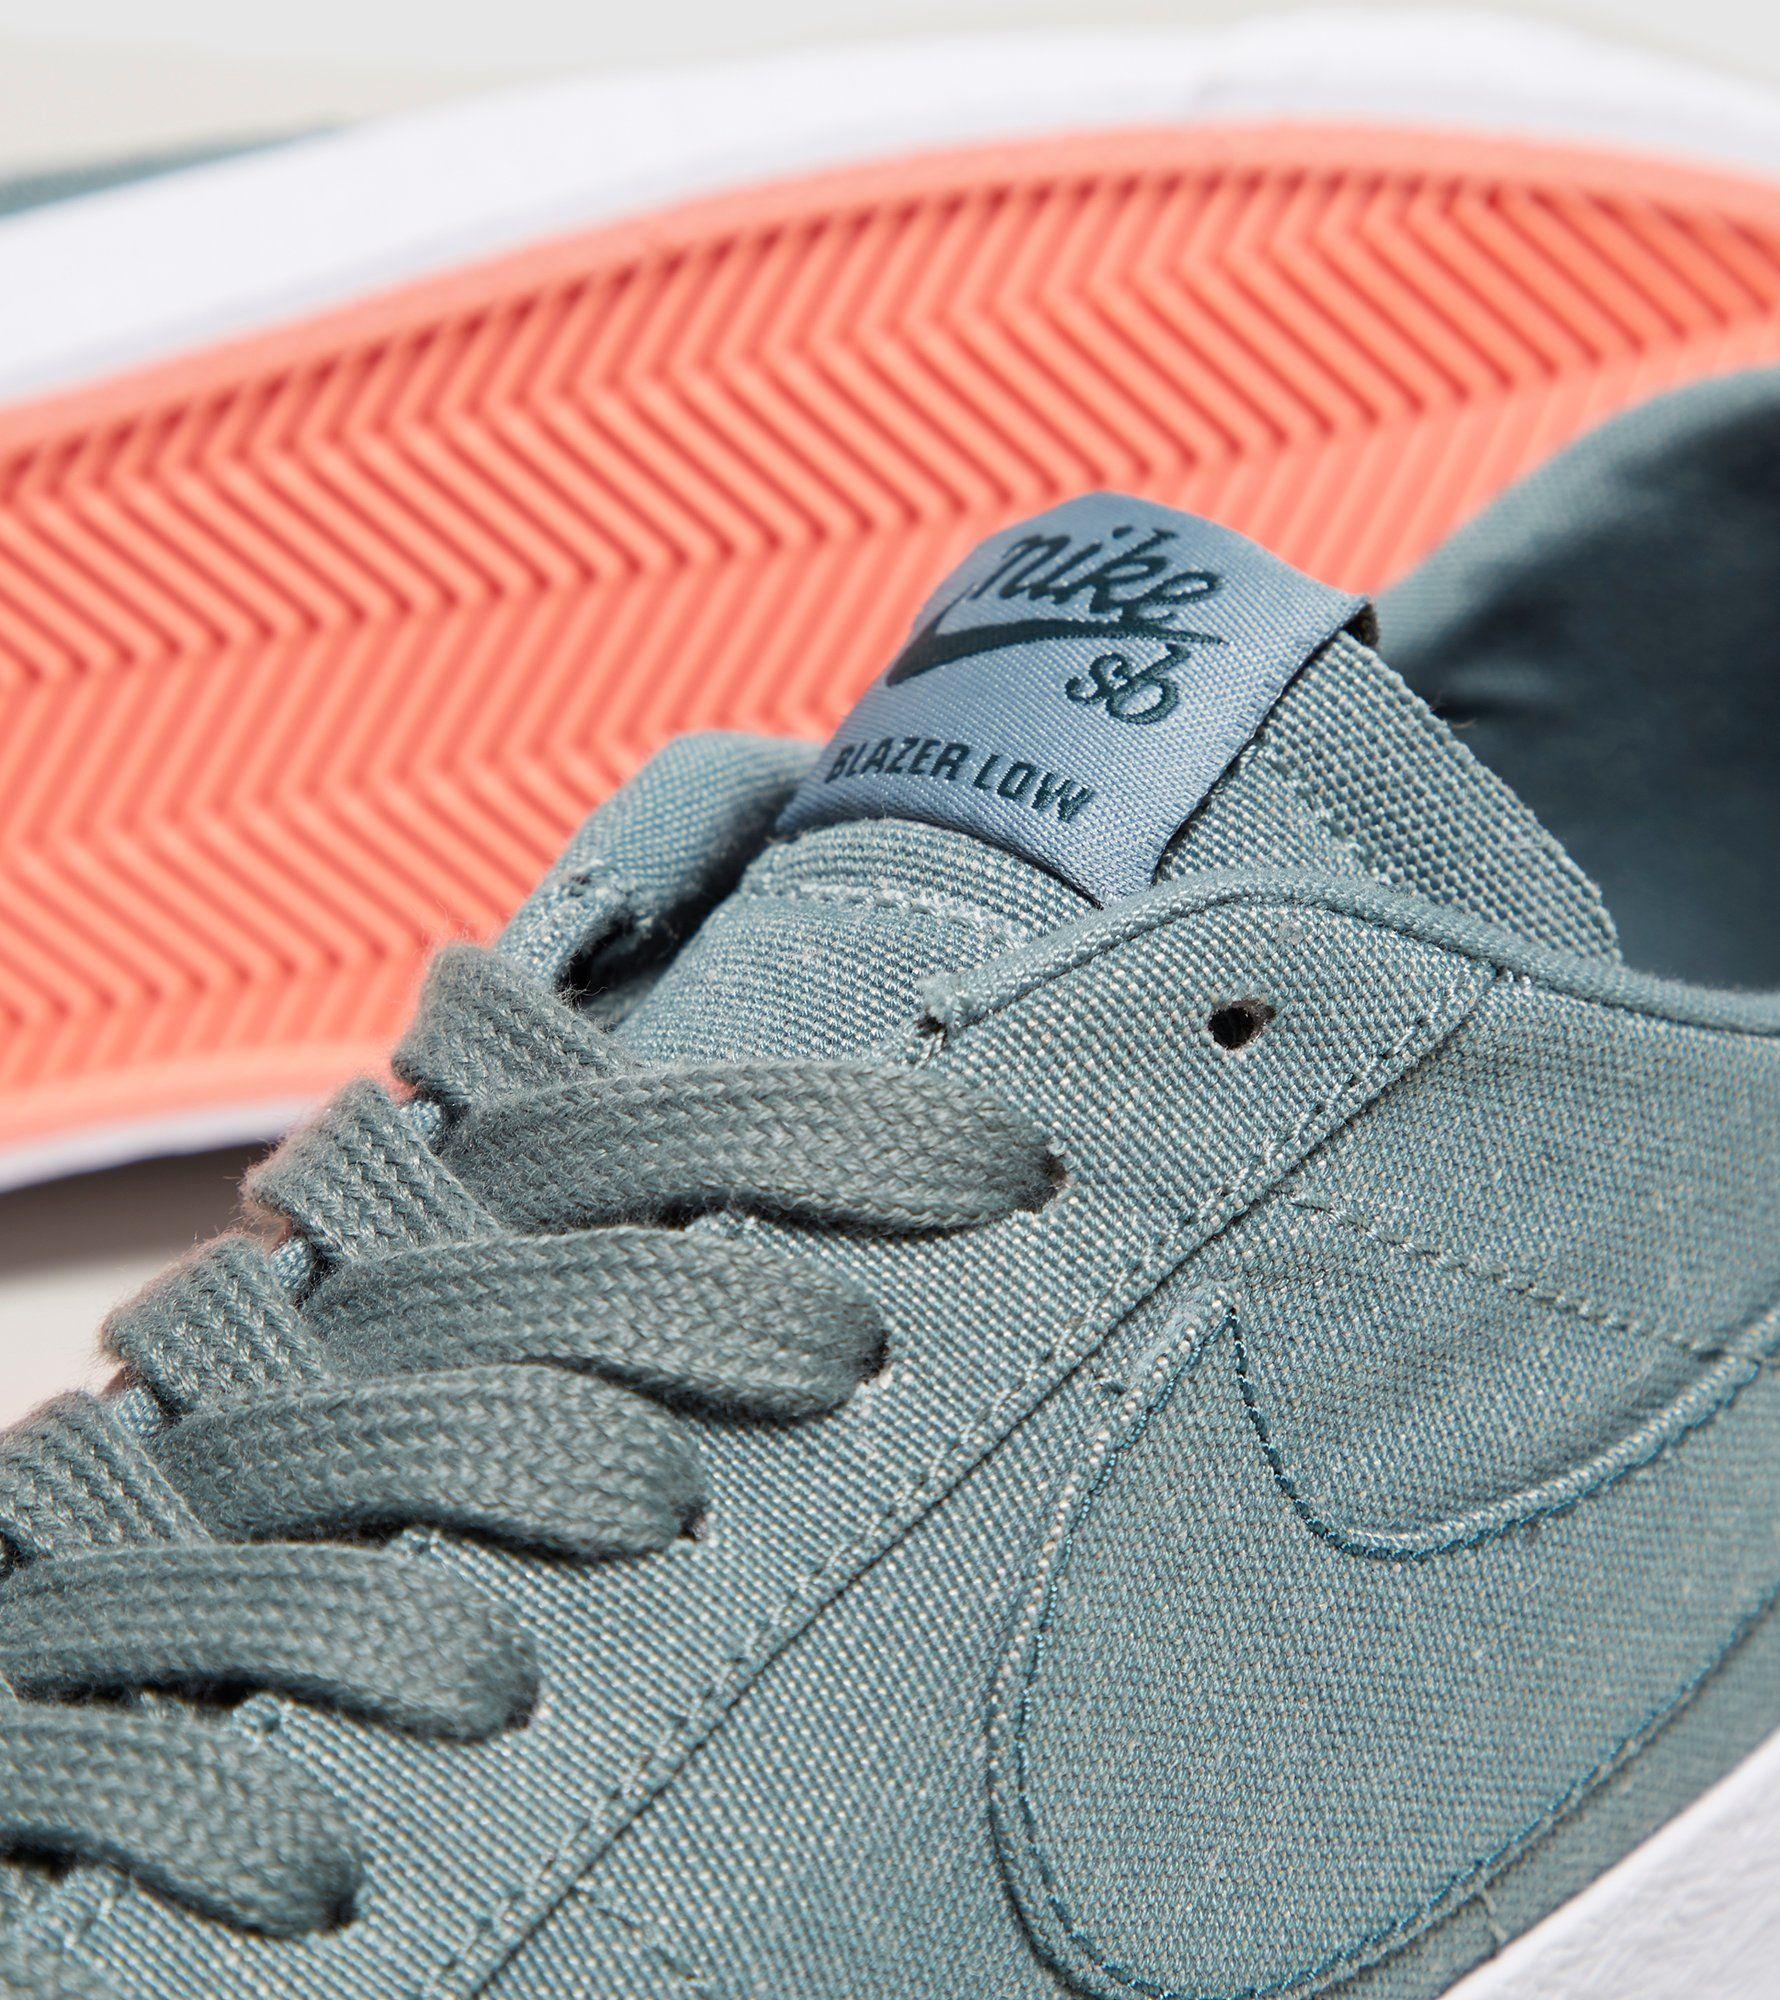 Nike SB Blazer Low Canvas Deconstructed